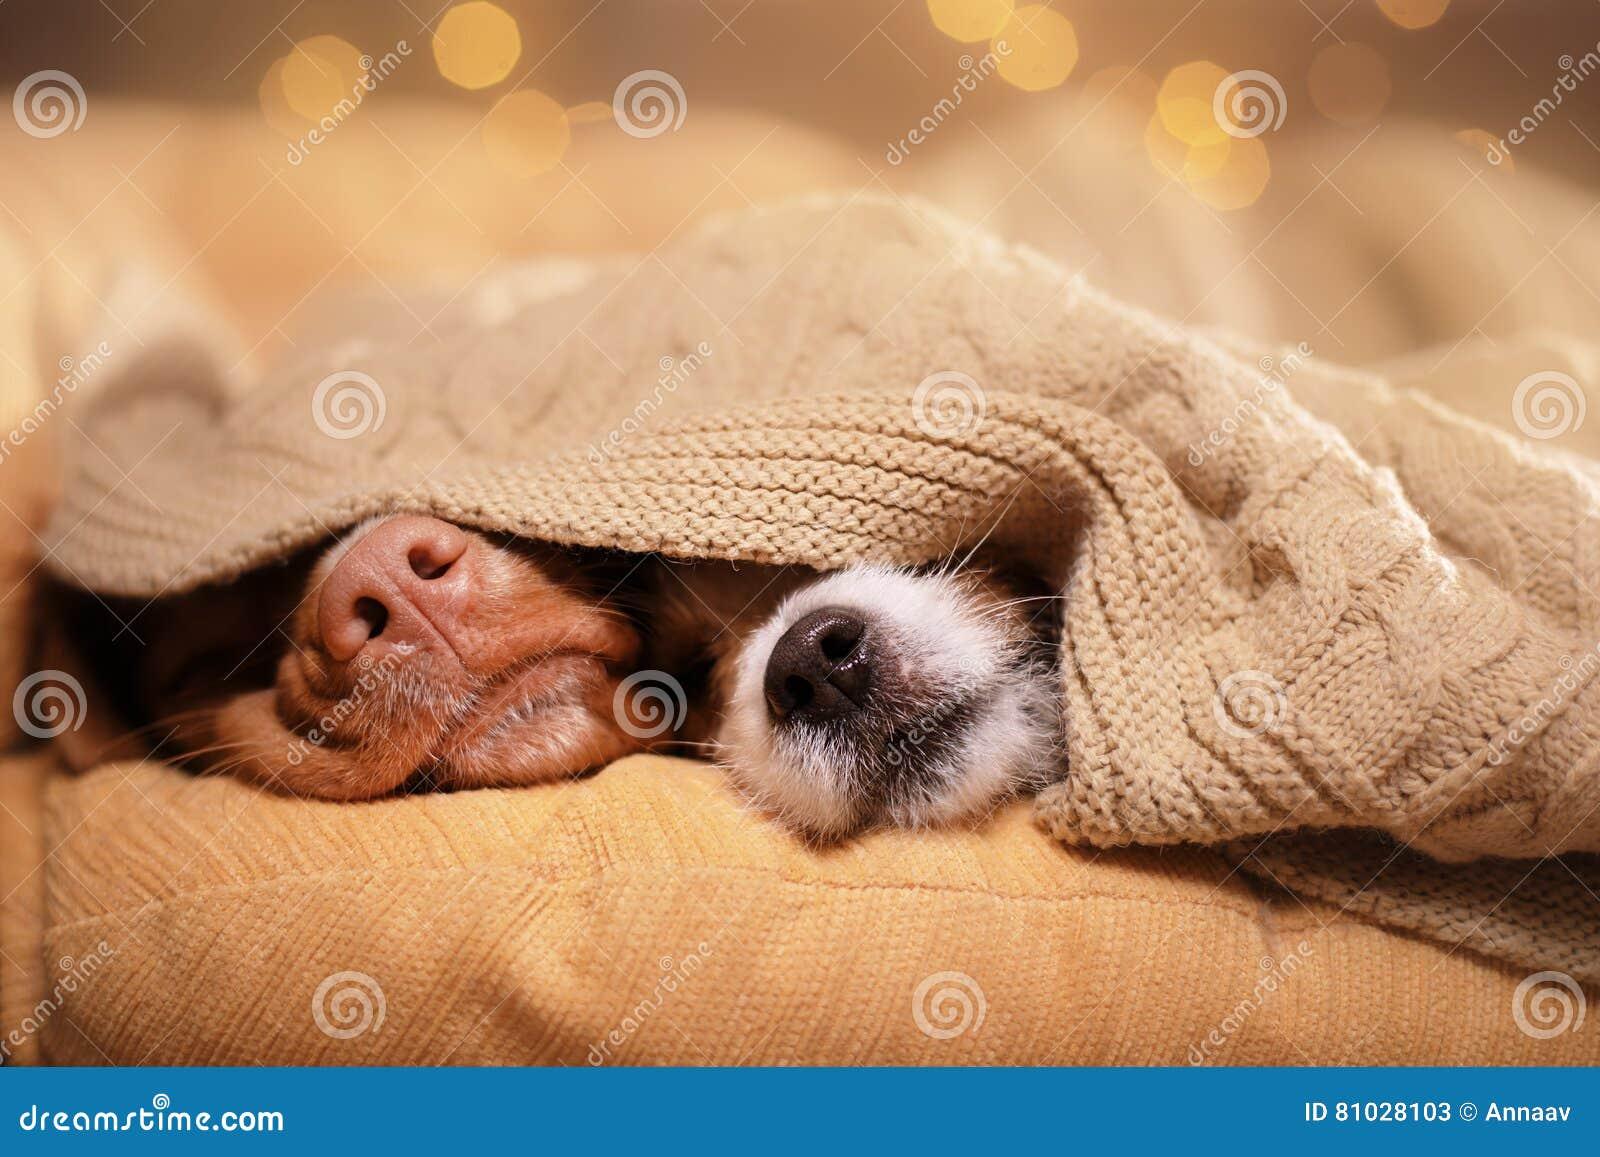 Perro Jack Russell Terrier y perro Nova Scotia Duck Tolling Retriever